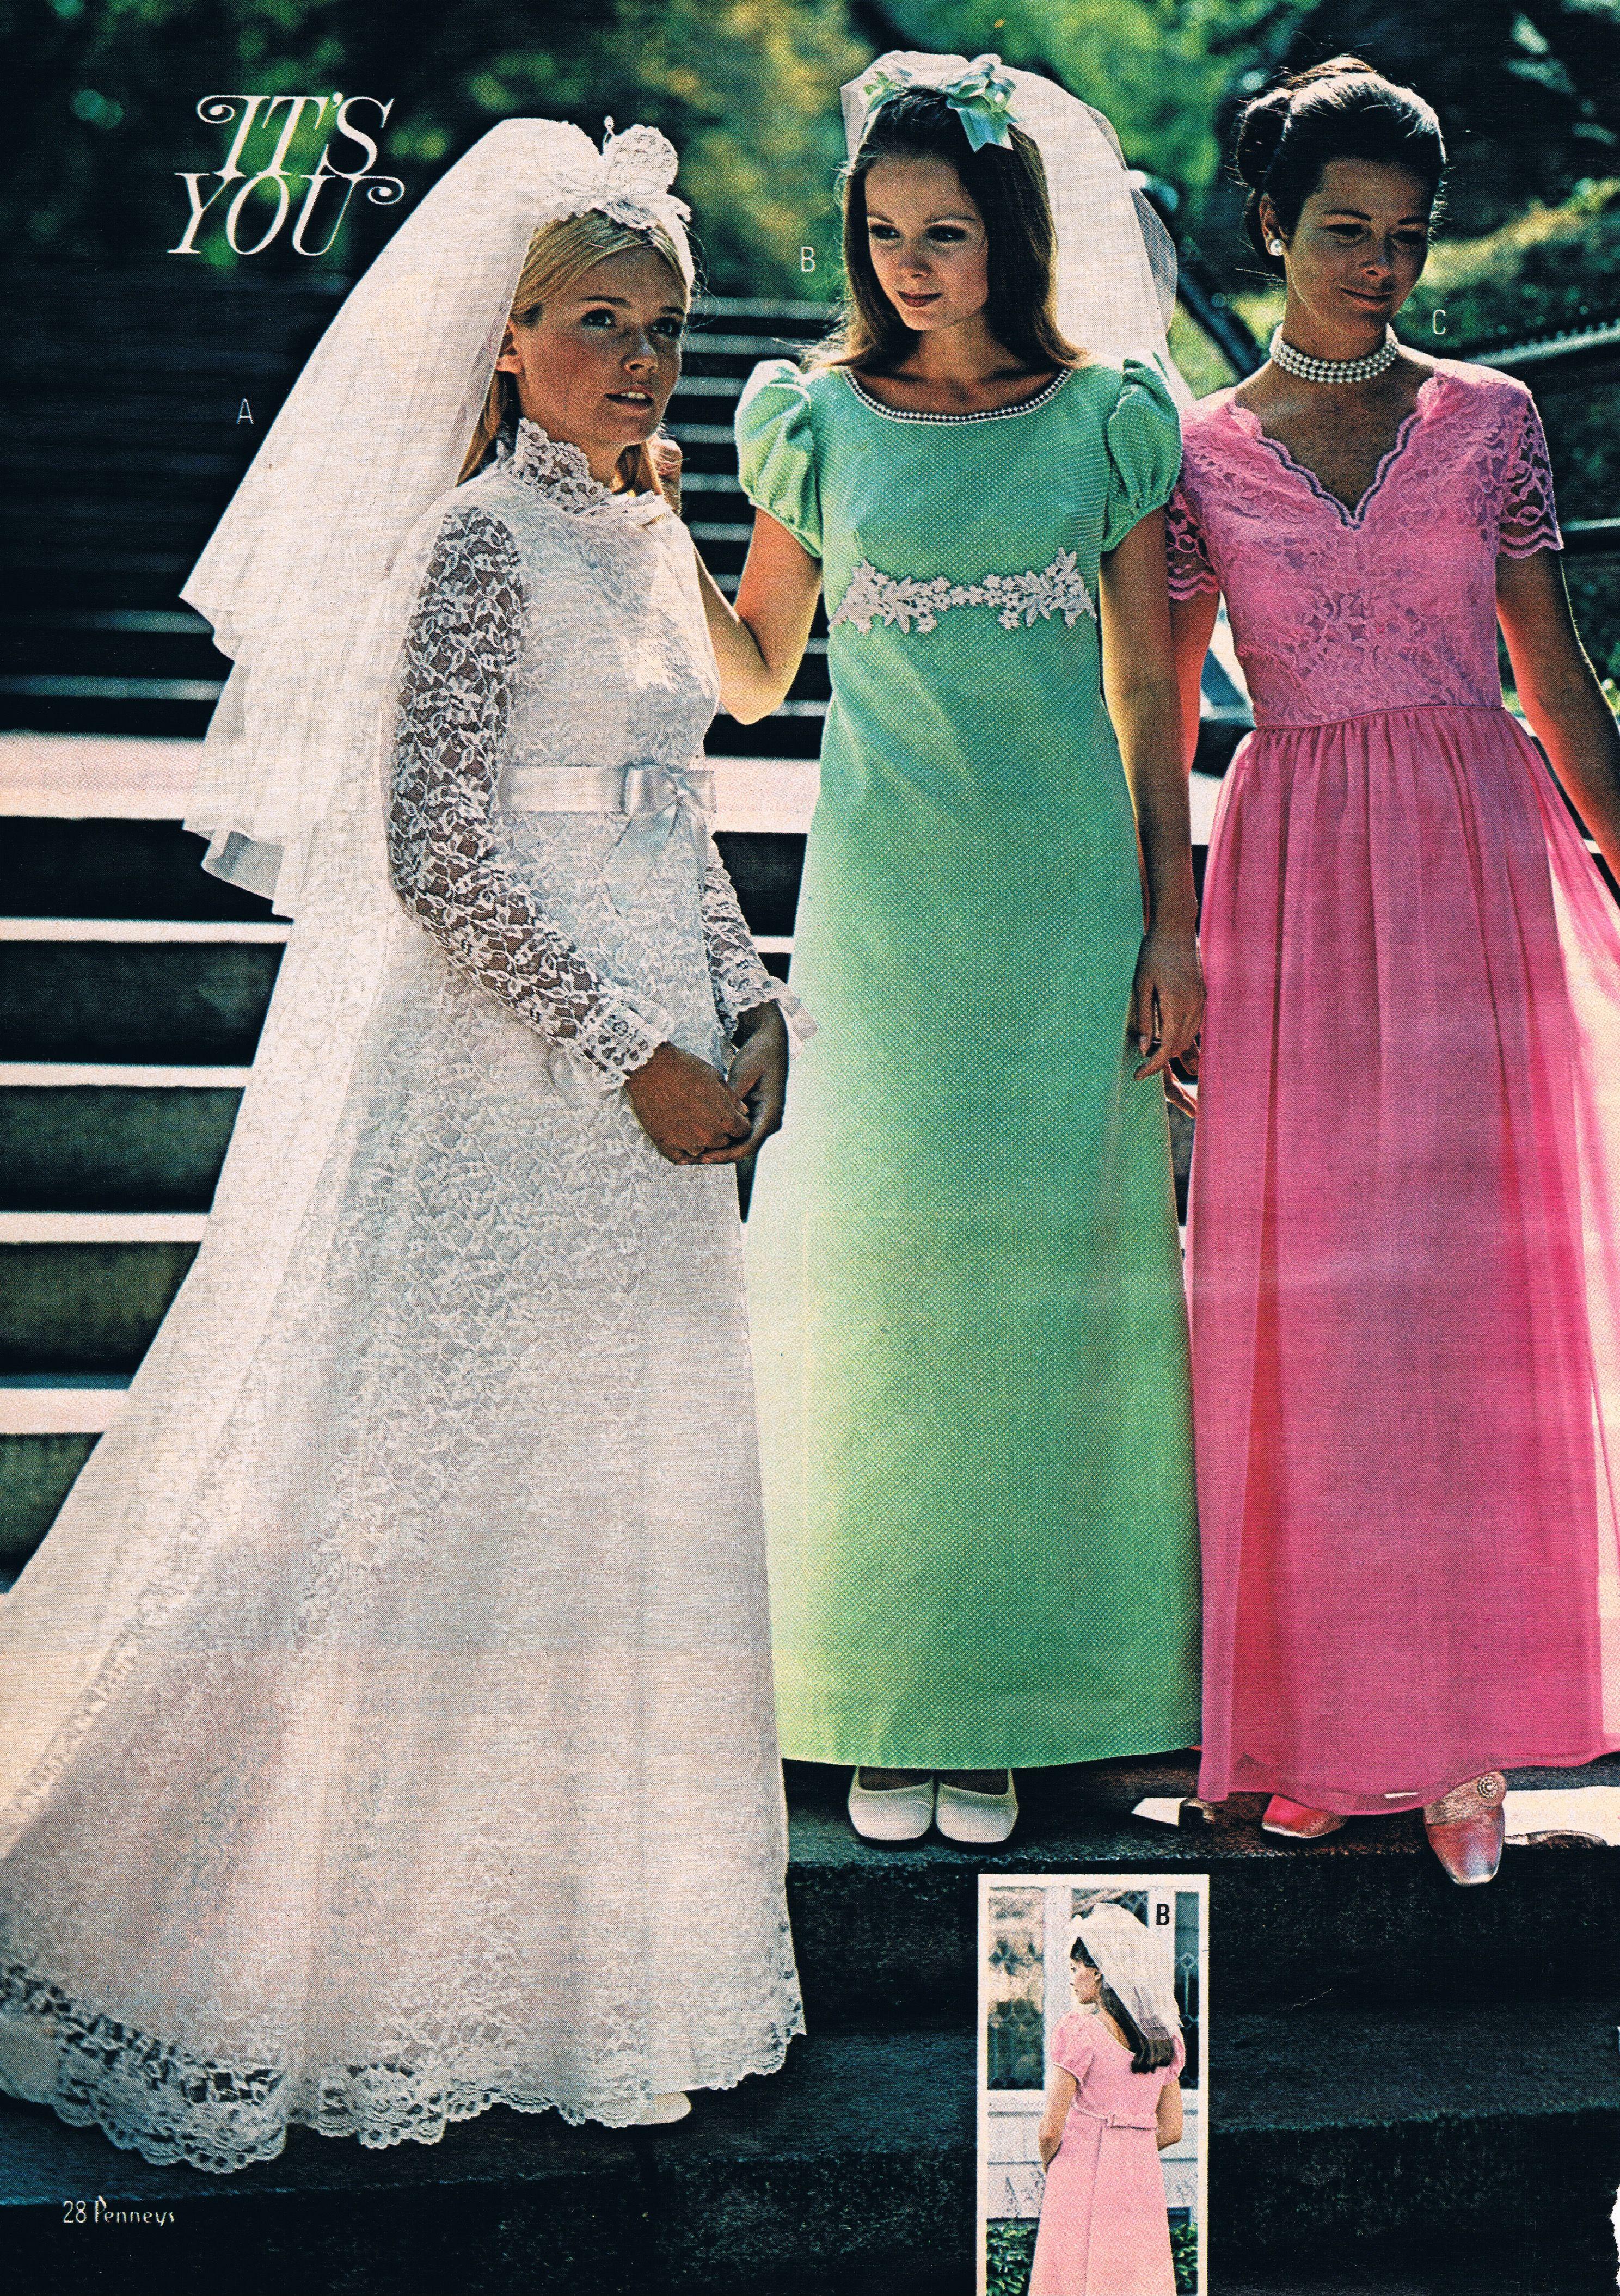 1970s Jc Penney Catalog Bridal Fashions 1960s Wedding Dresses Vintage: Jcpenney Vintage Wedding Dress At Websimilar.org